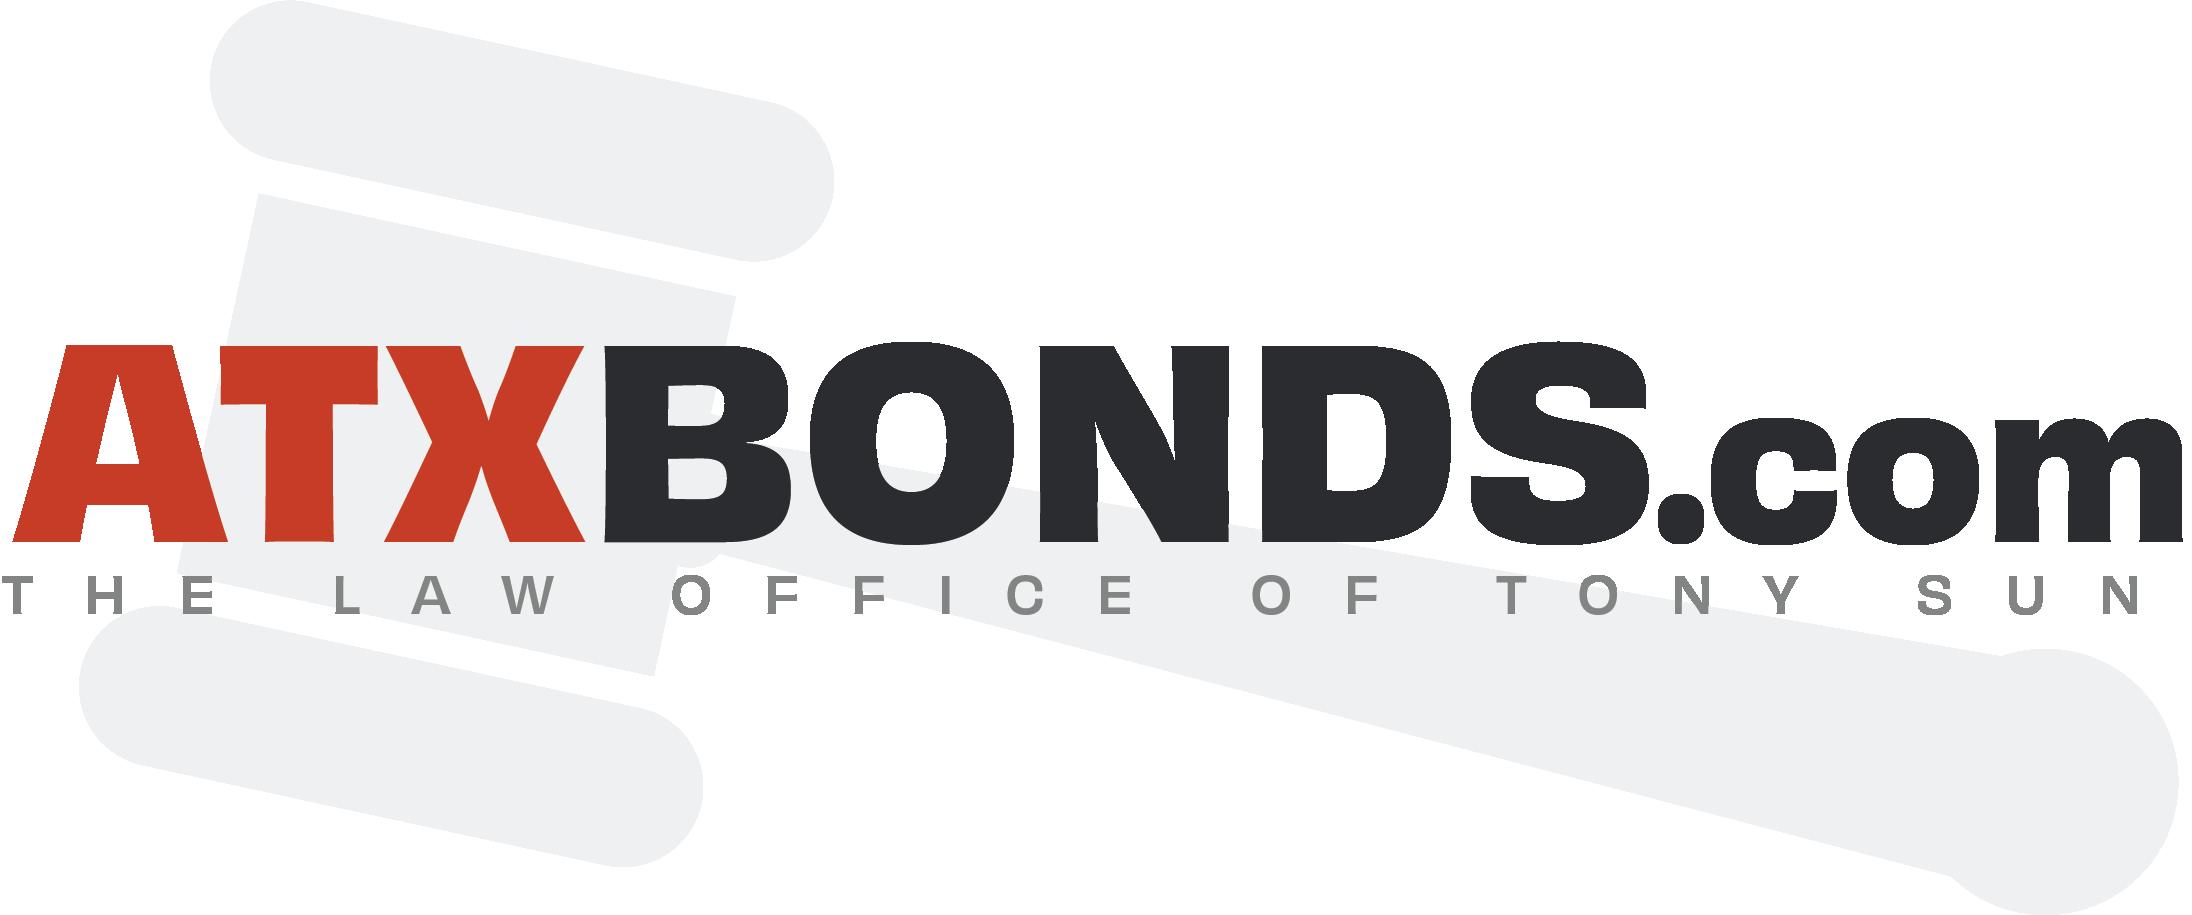 ATX Bonds